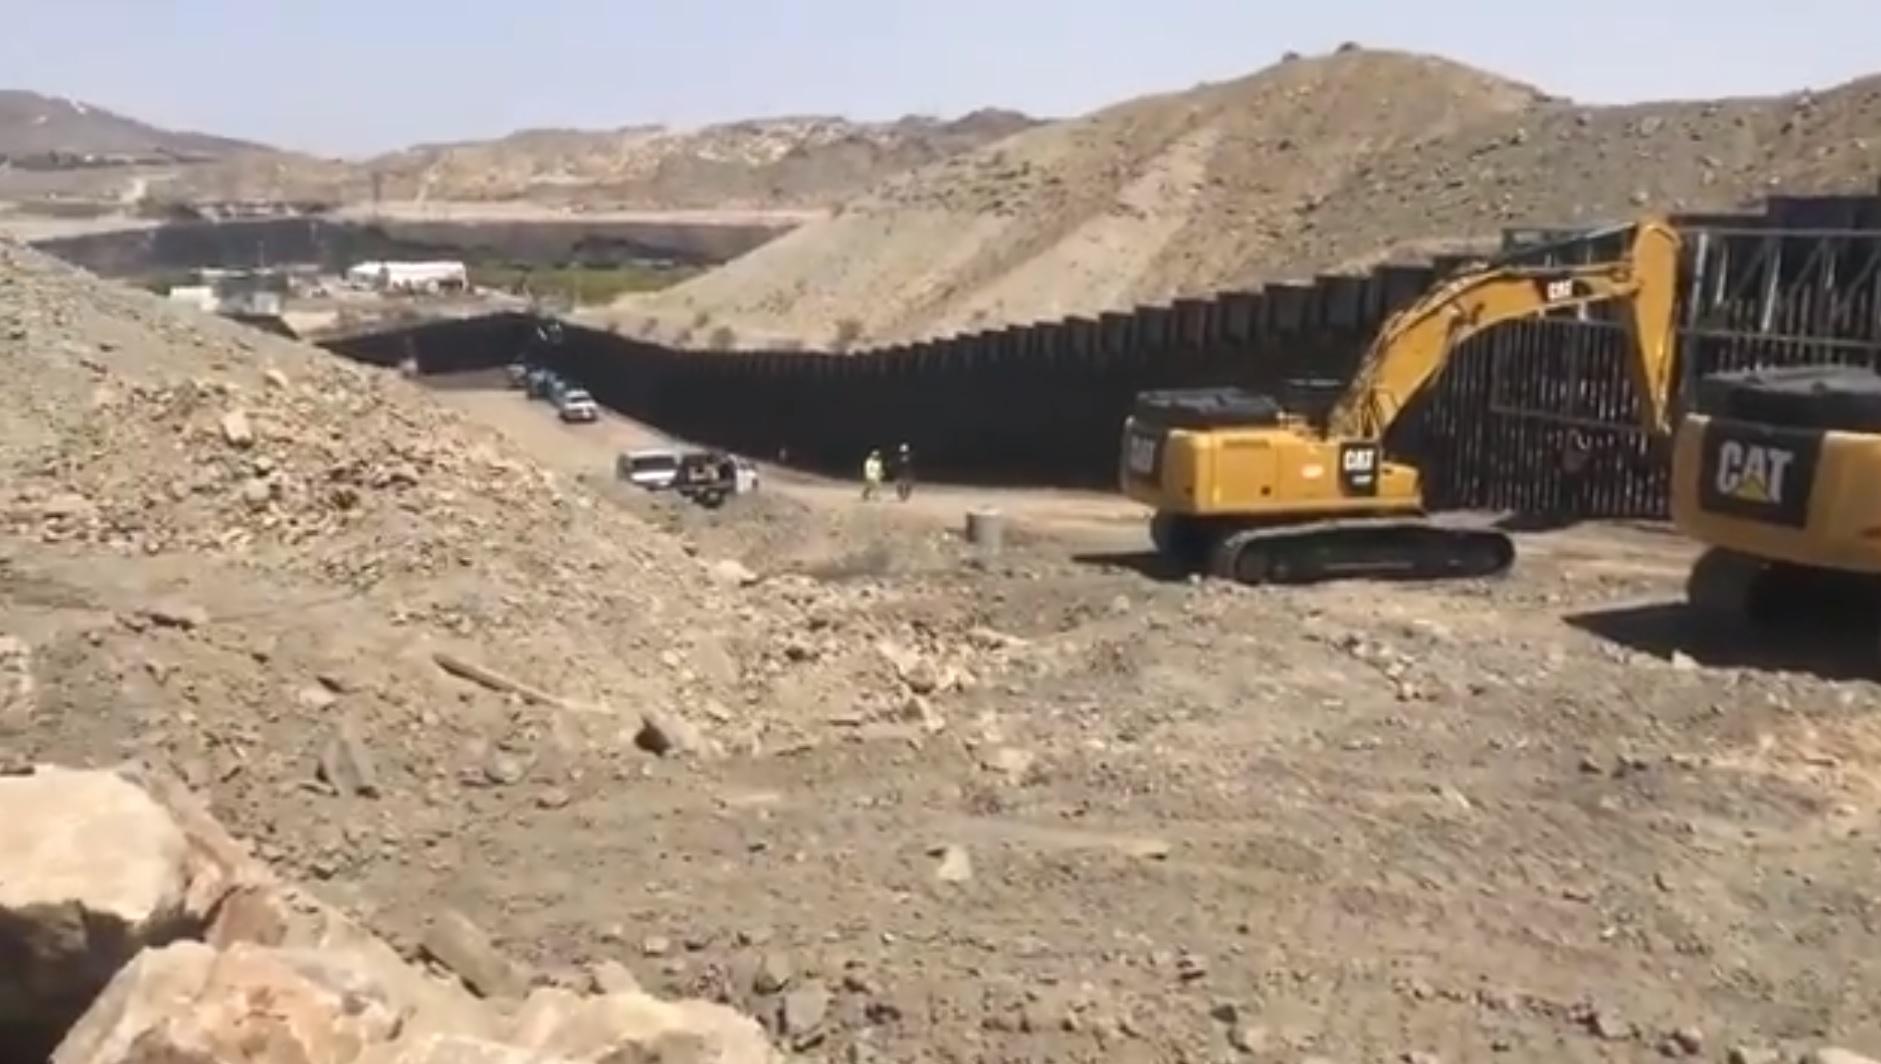 Valla fronteriza, Nuevo México, We Build the Wall, Brian Kolfage,